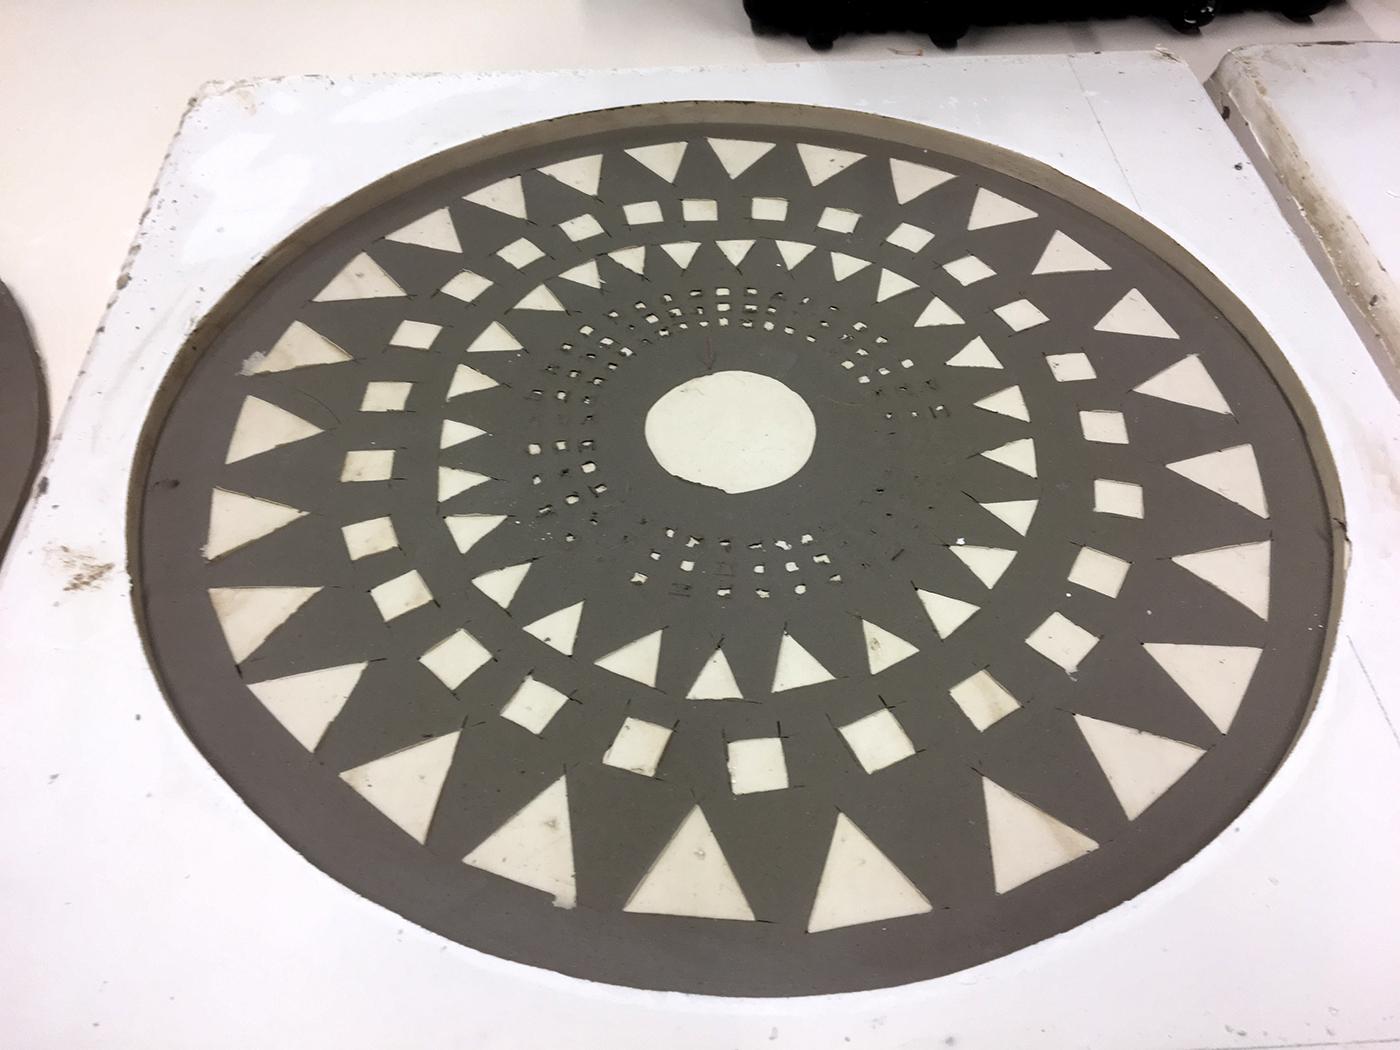 tile ceramic tile lowrelief tile wall art porcelain Harvard Ceramics Program